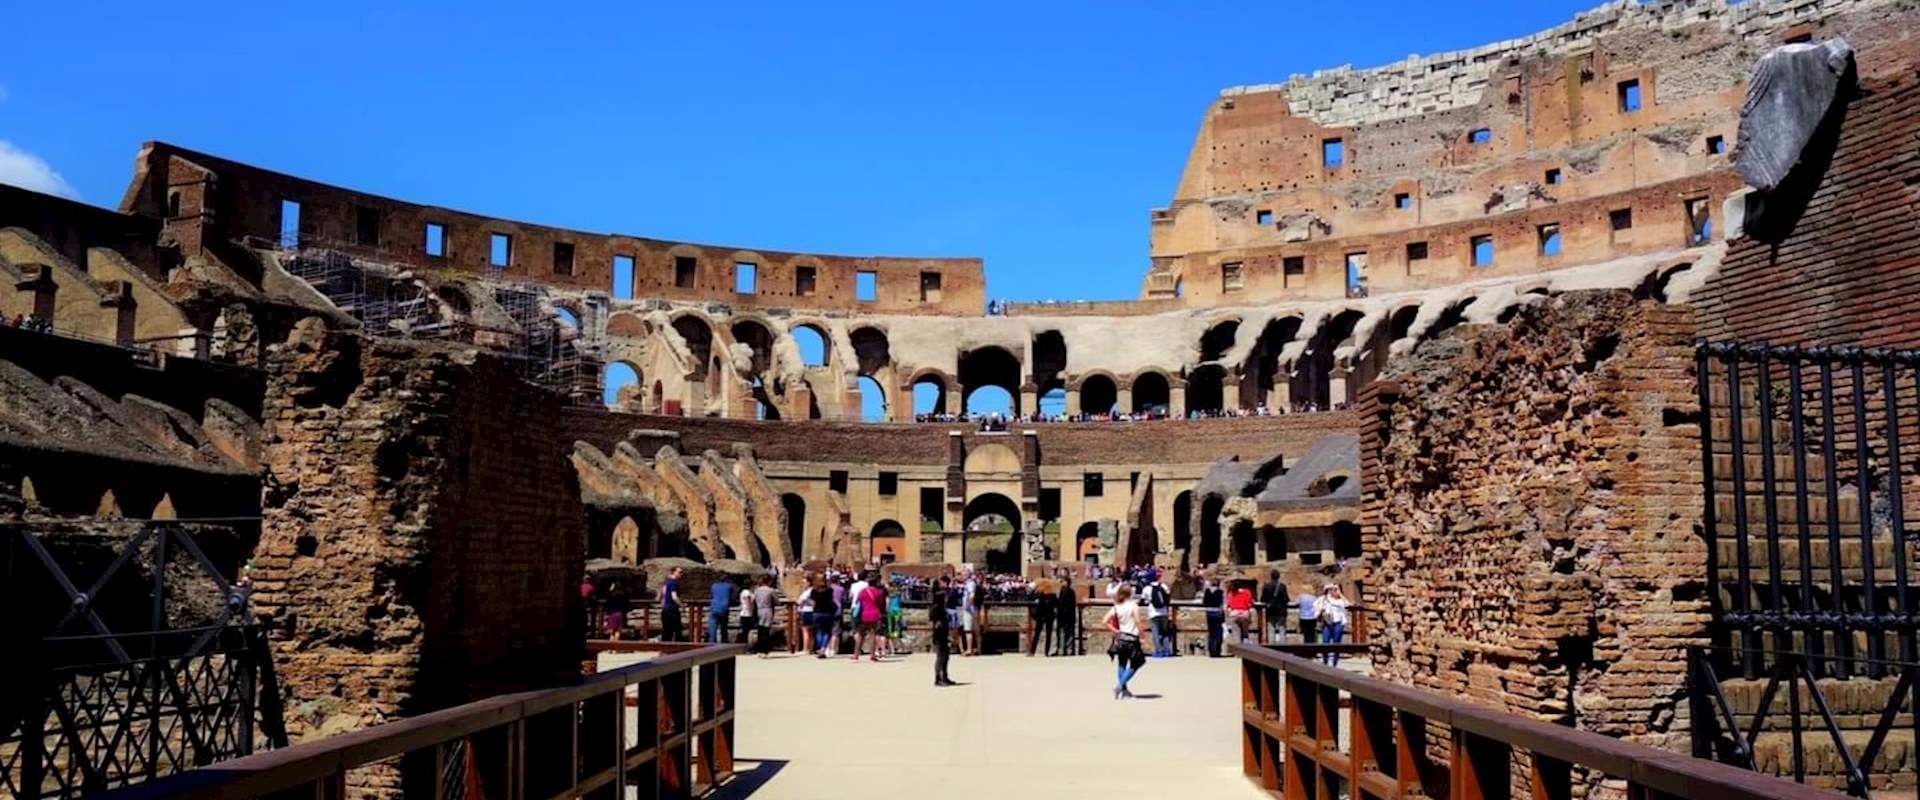 Colosseum Arena Floor Tour With Breakfast Dark Rome